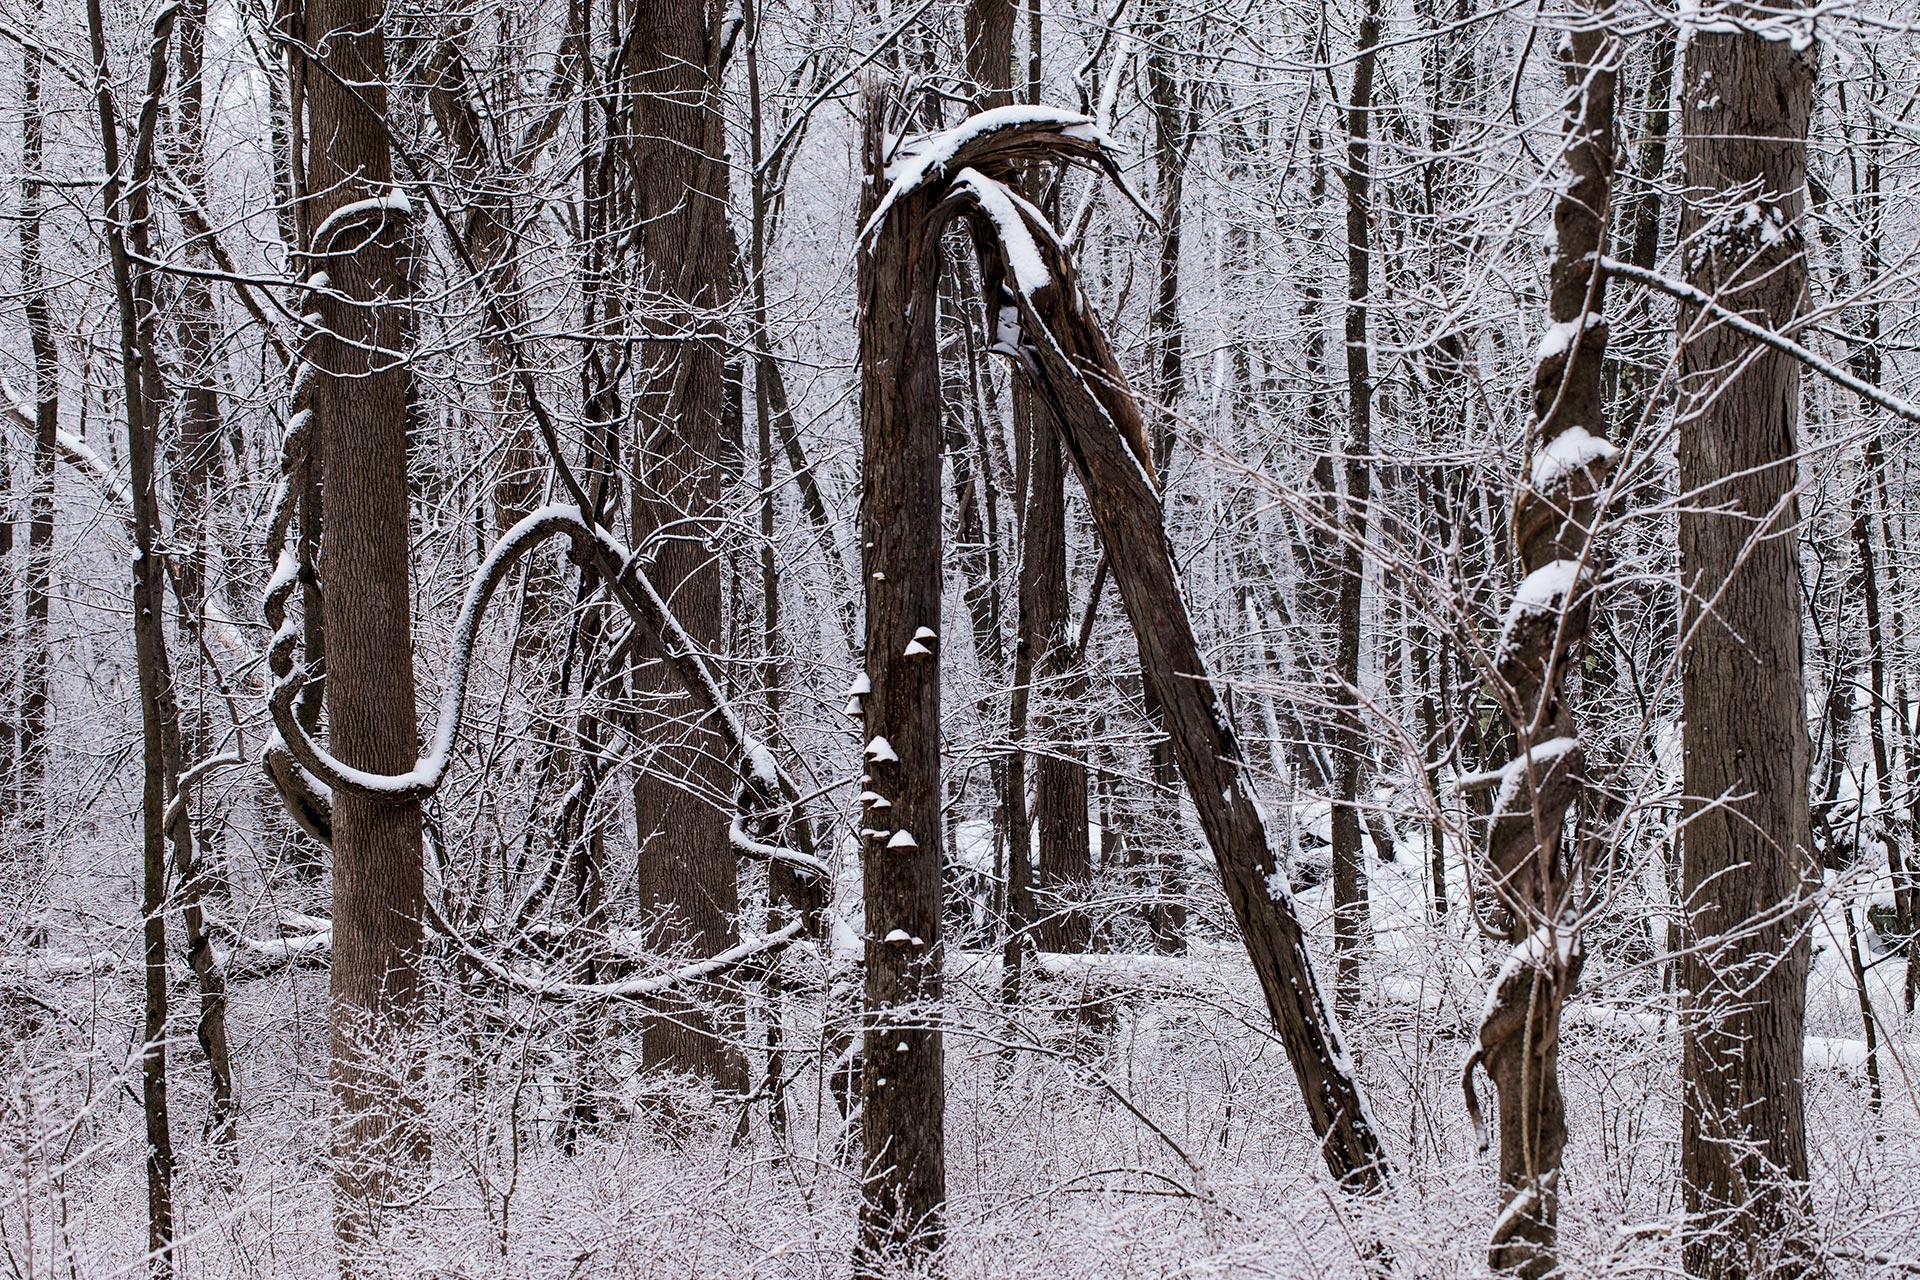 4813_trees_snow_1920.jpg